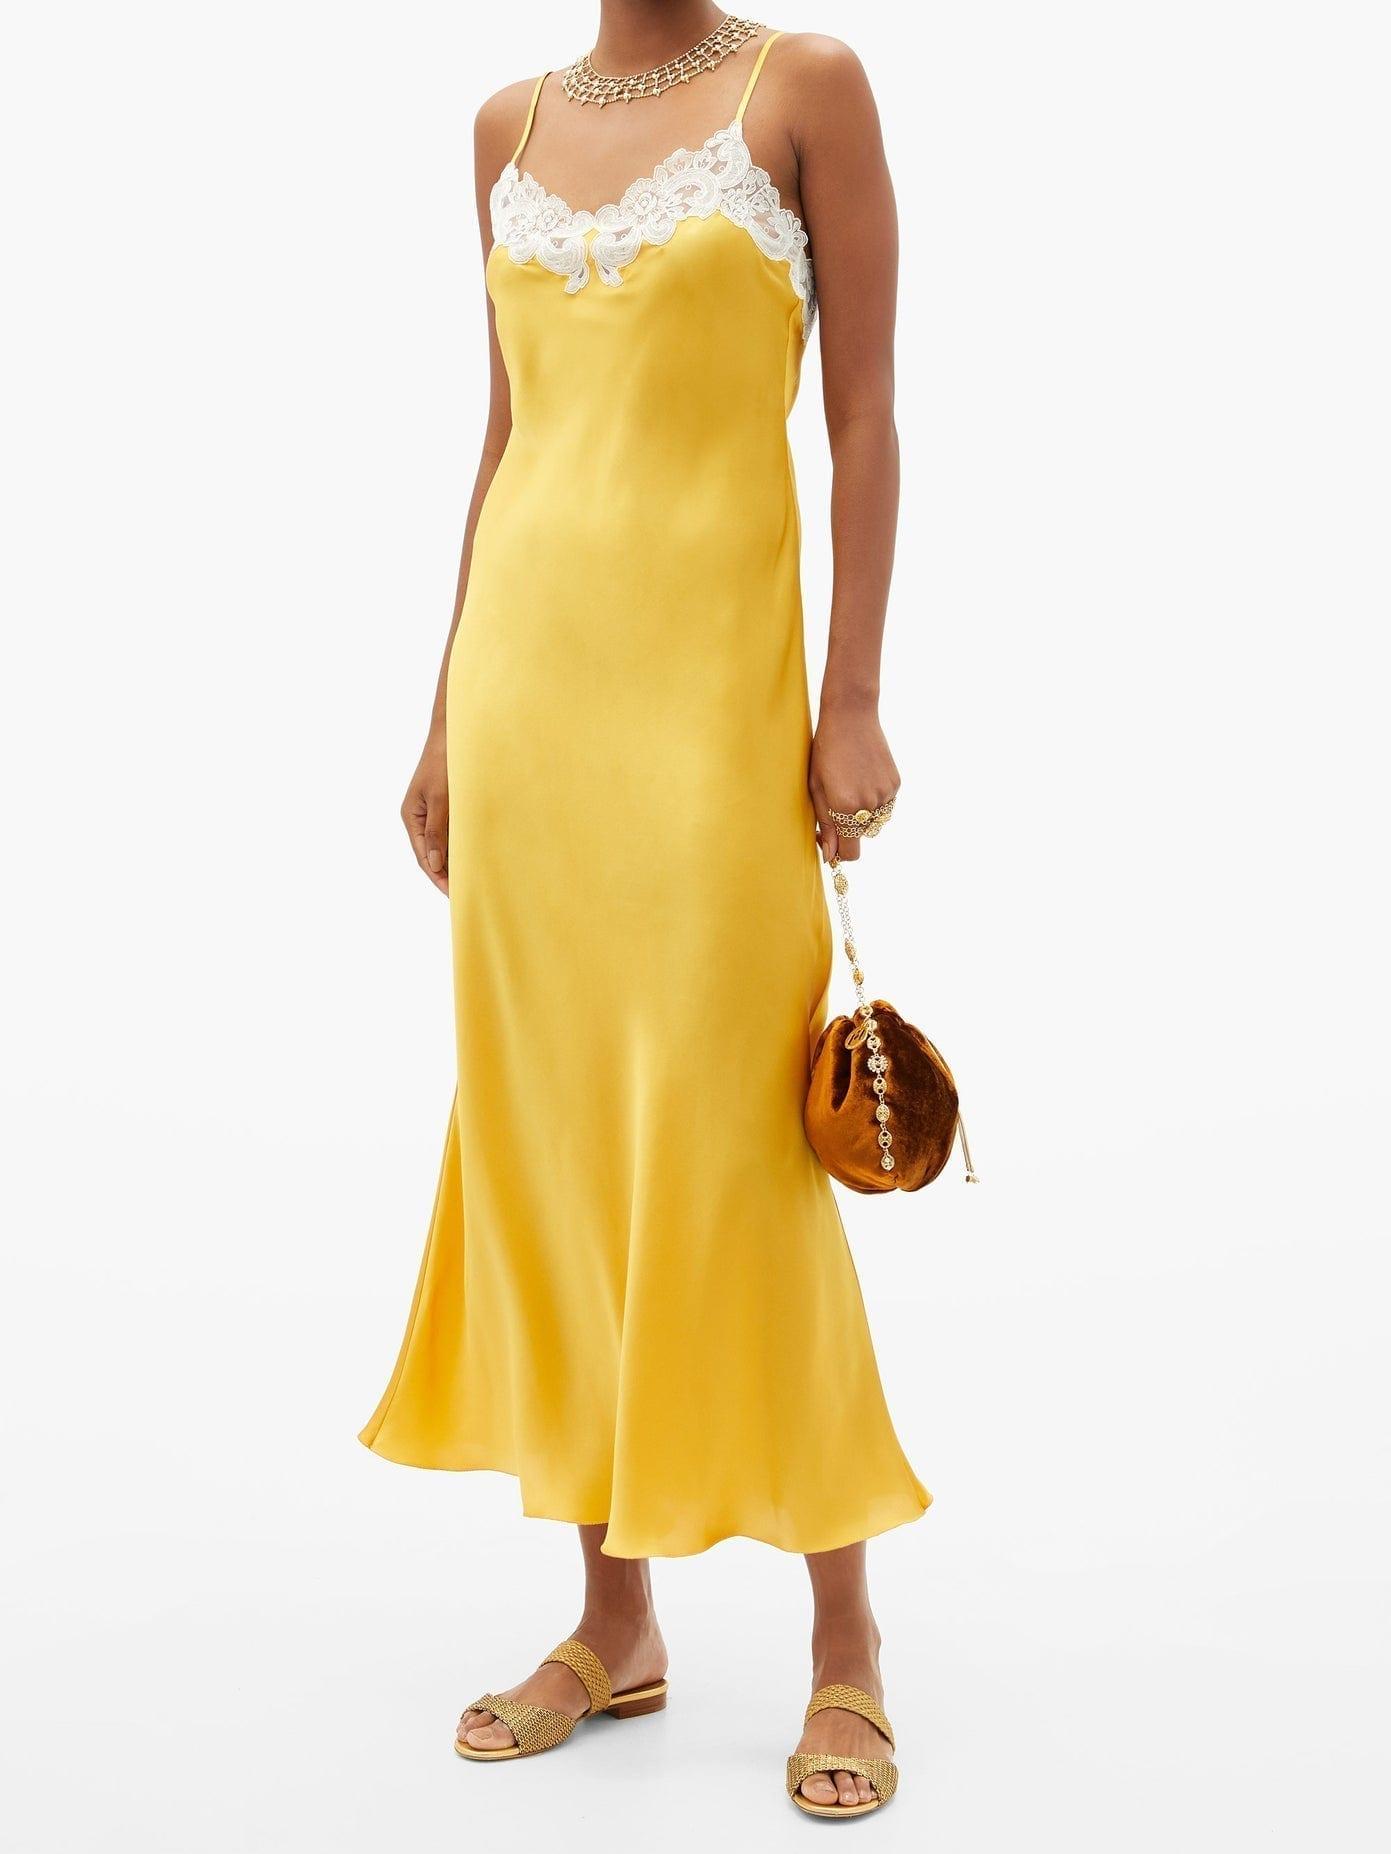 ISSIMO X LORETTA CAPONI Lace-trimmed Silk-charmeuse Slip Dress